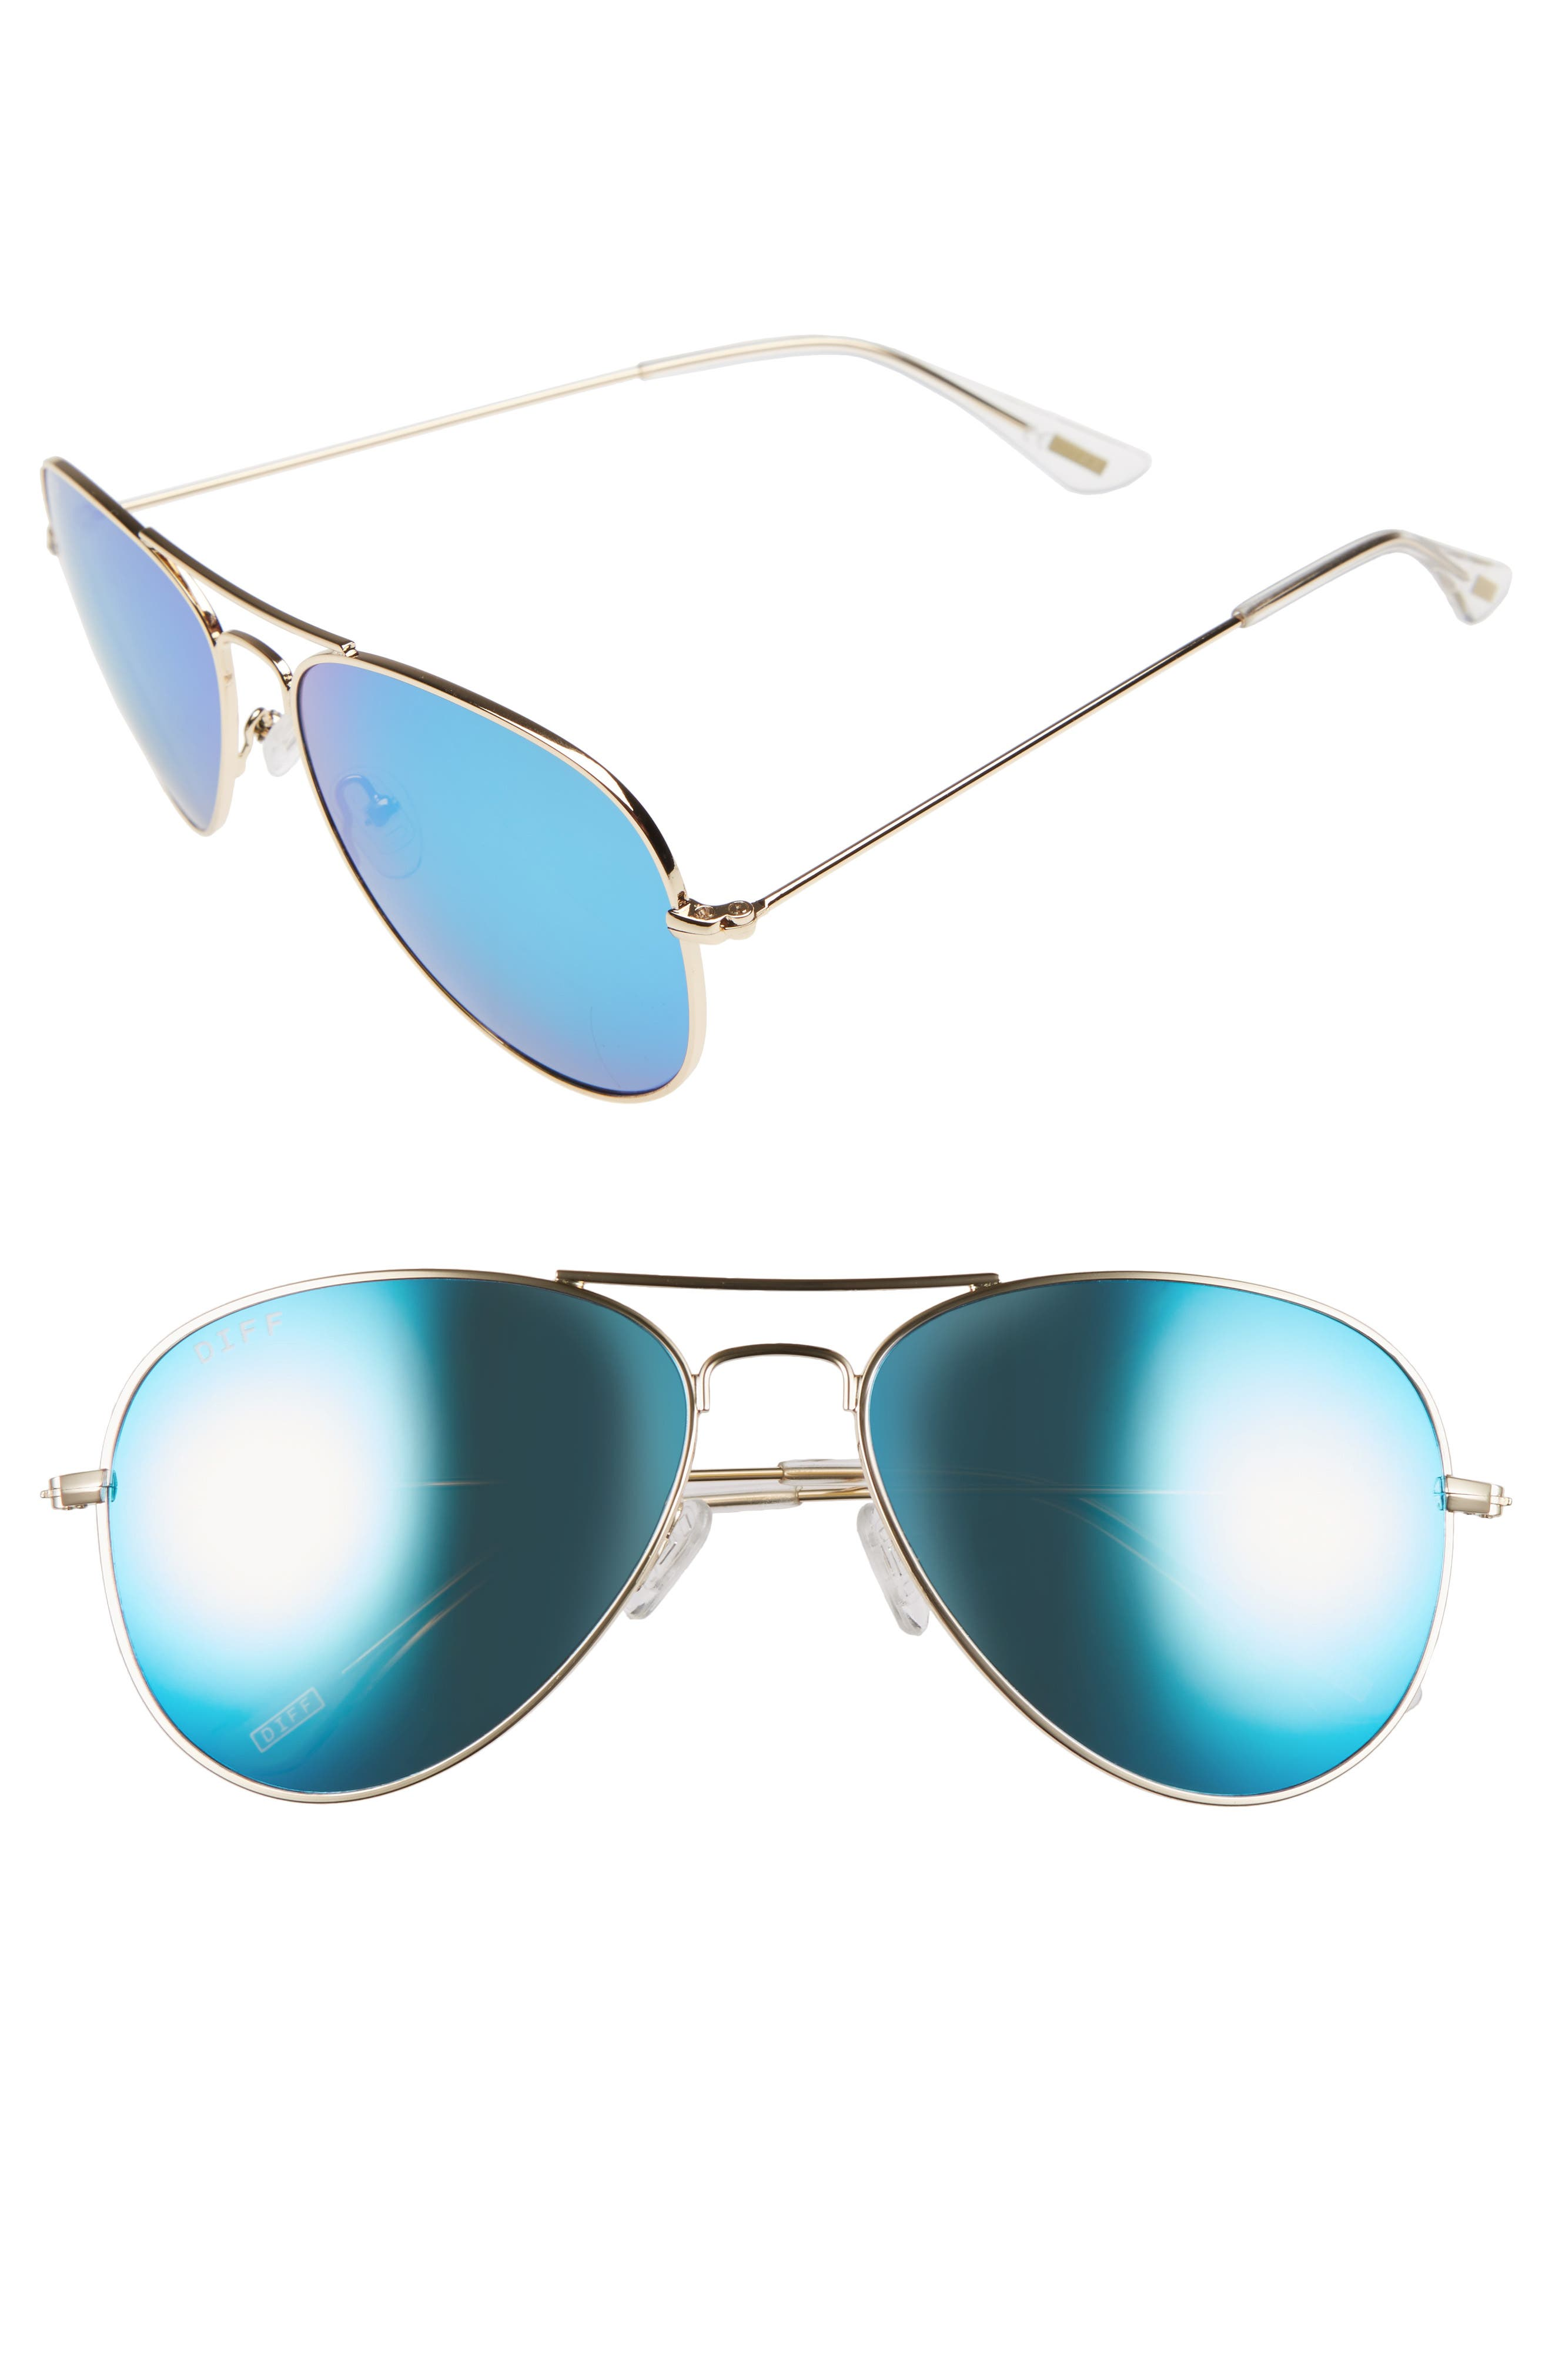 Cruz 57mm Metal Aviator Sunglasses,                         Main,                         color, GOLD/ BLUE